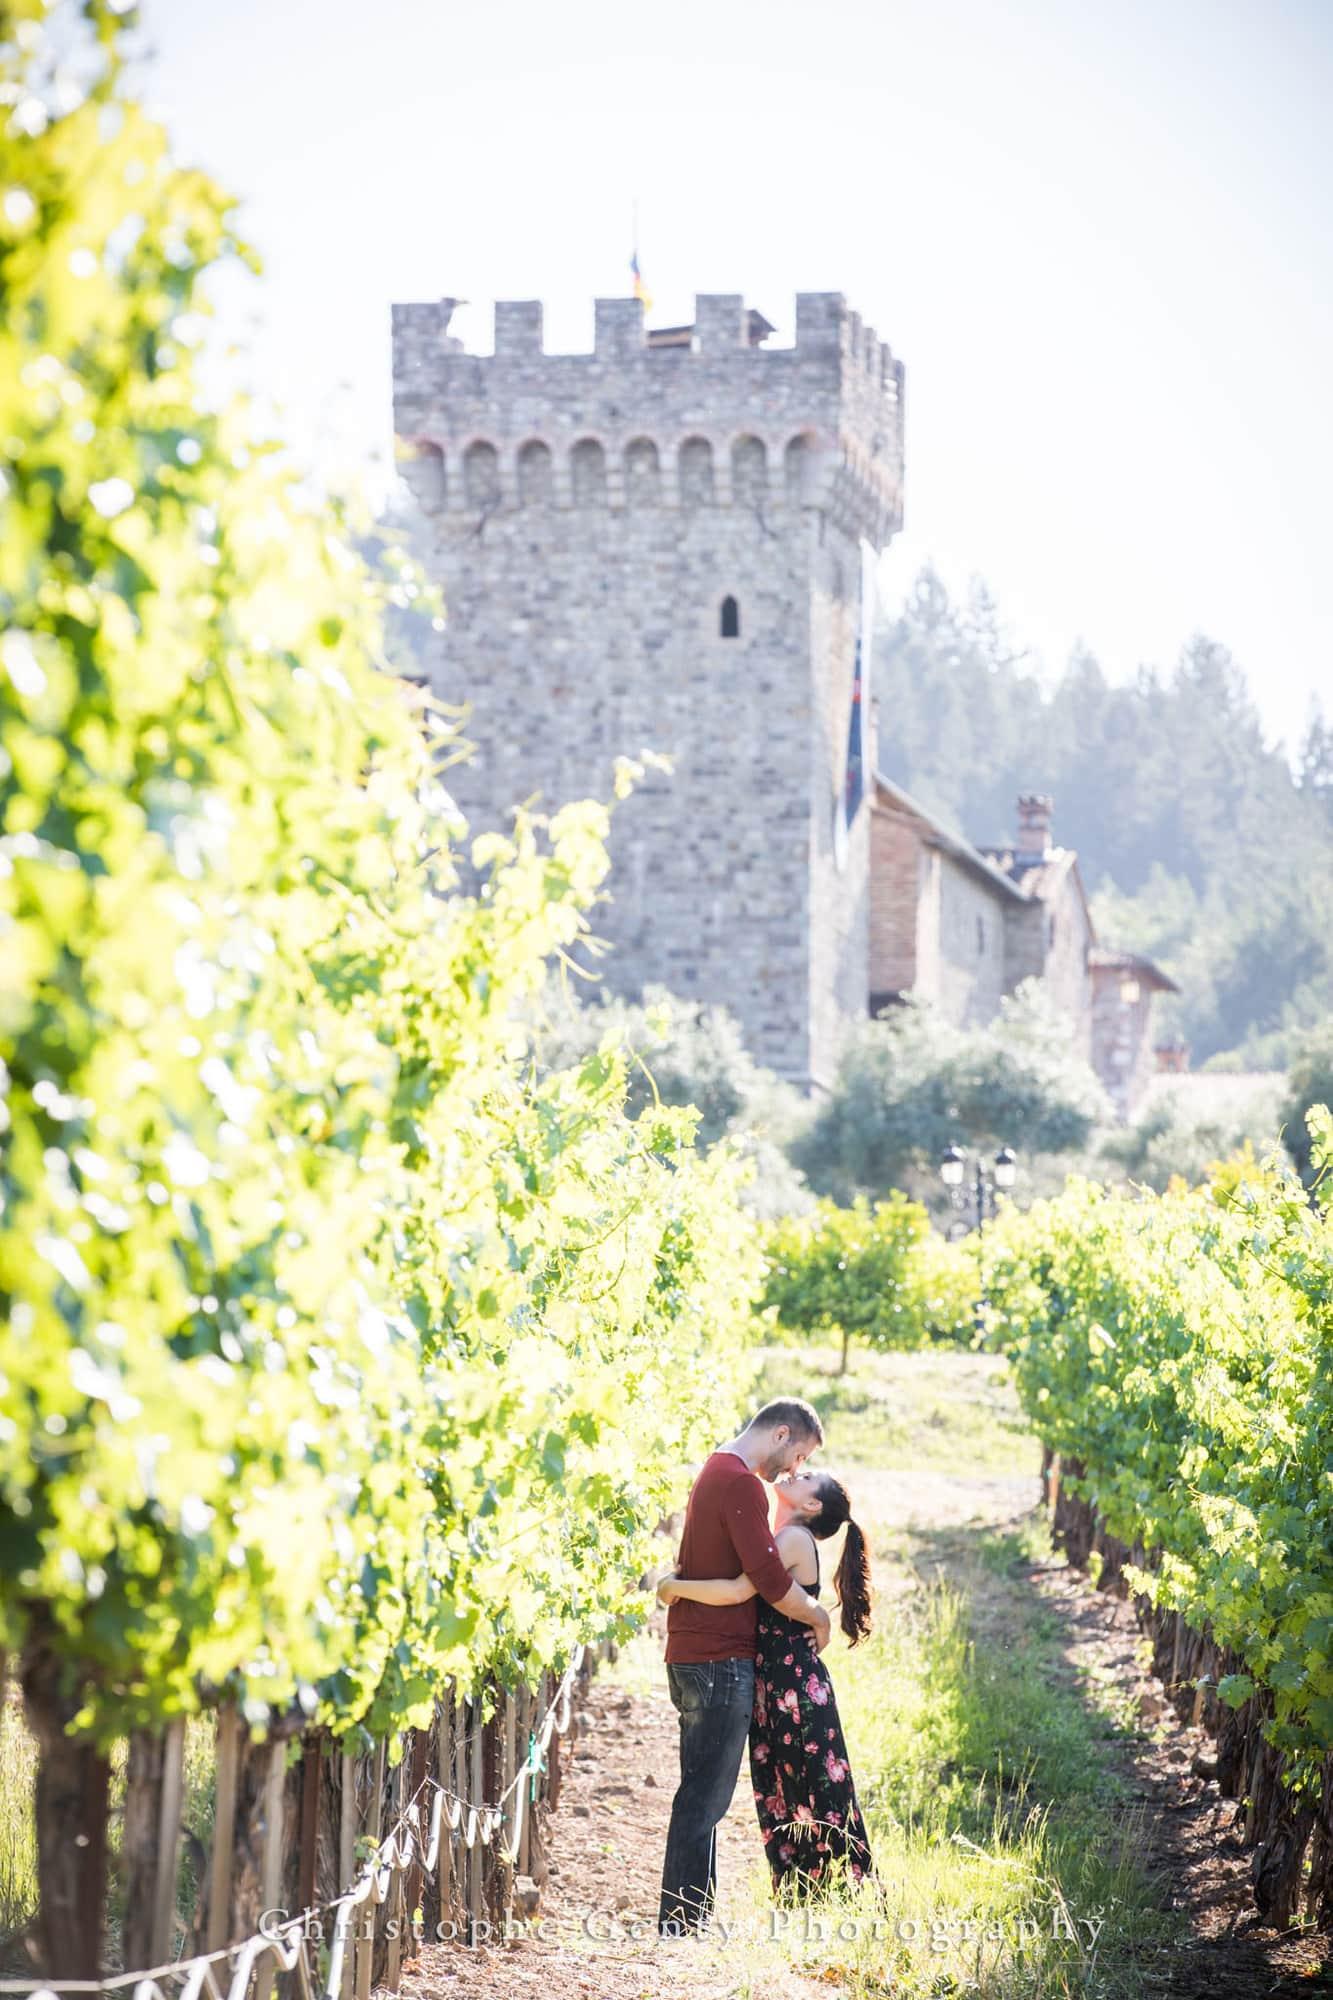 Castello di Amorosa Marriage Proposal Photography 307